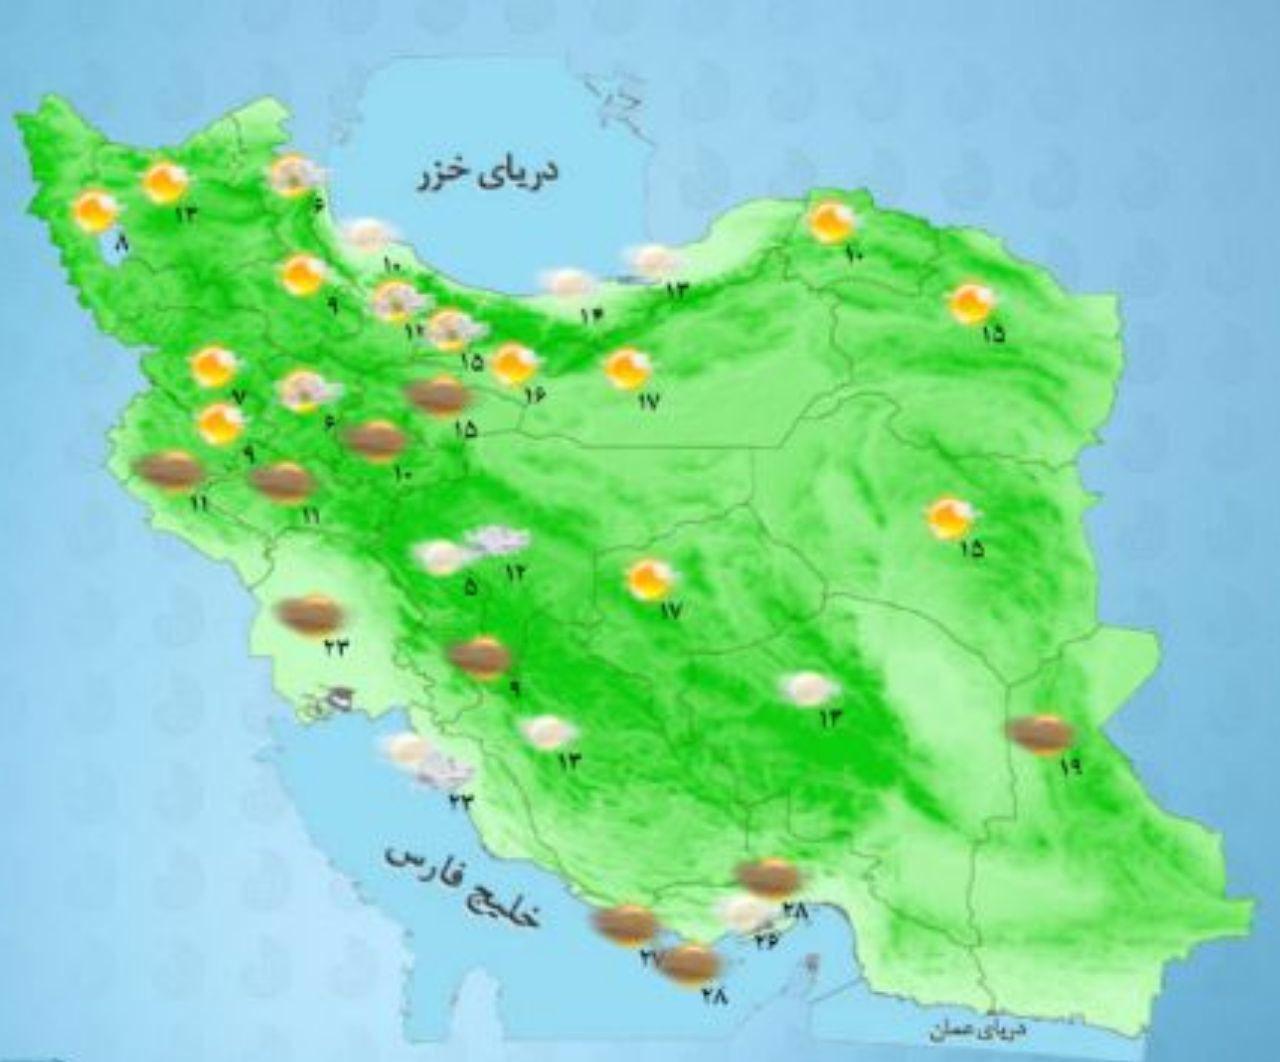 www.dustaan.com پنجشنبه 6 اردیبهشت / دمای مراکز استان های کشور +نقشه